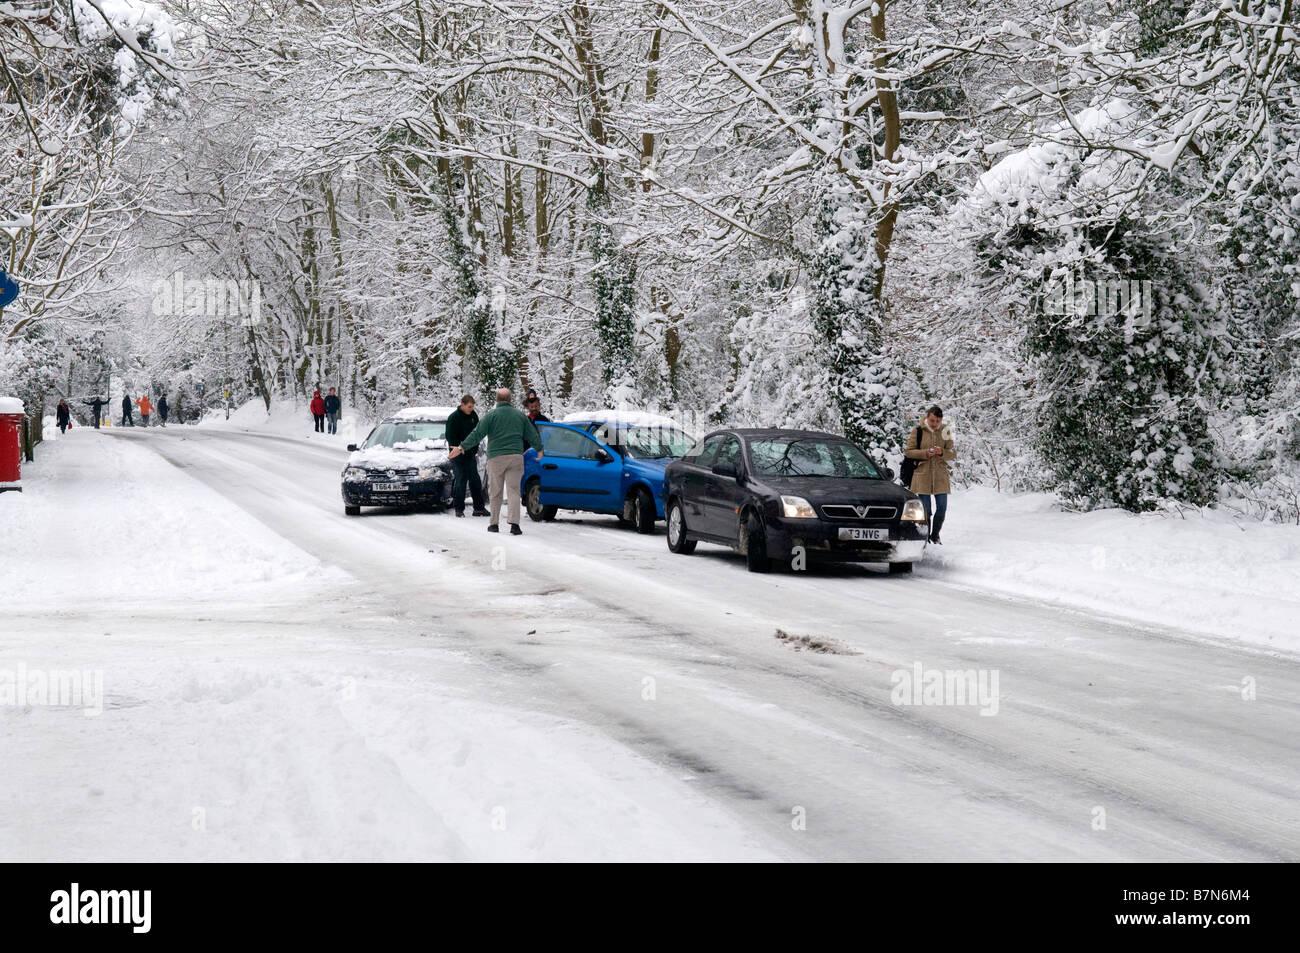 Minor accident due to slippery, icy road, in Weybridge, Surrey - Stock Image